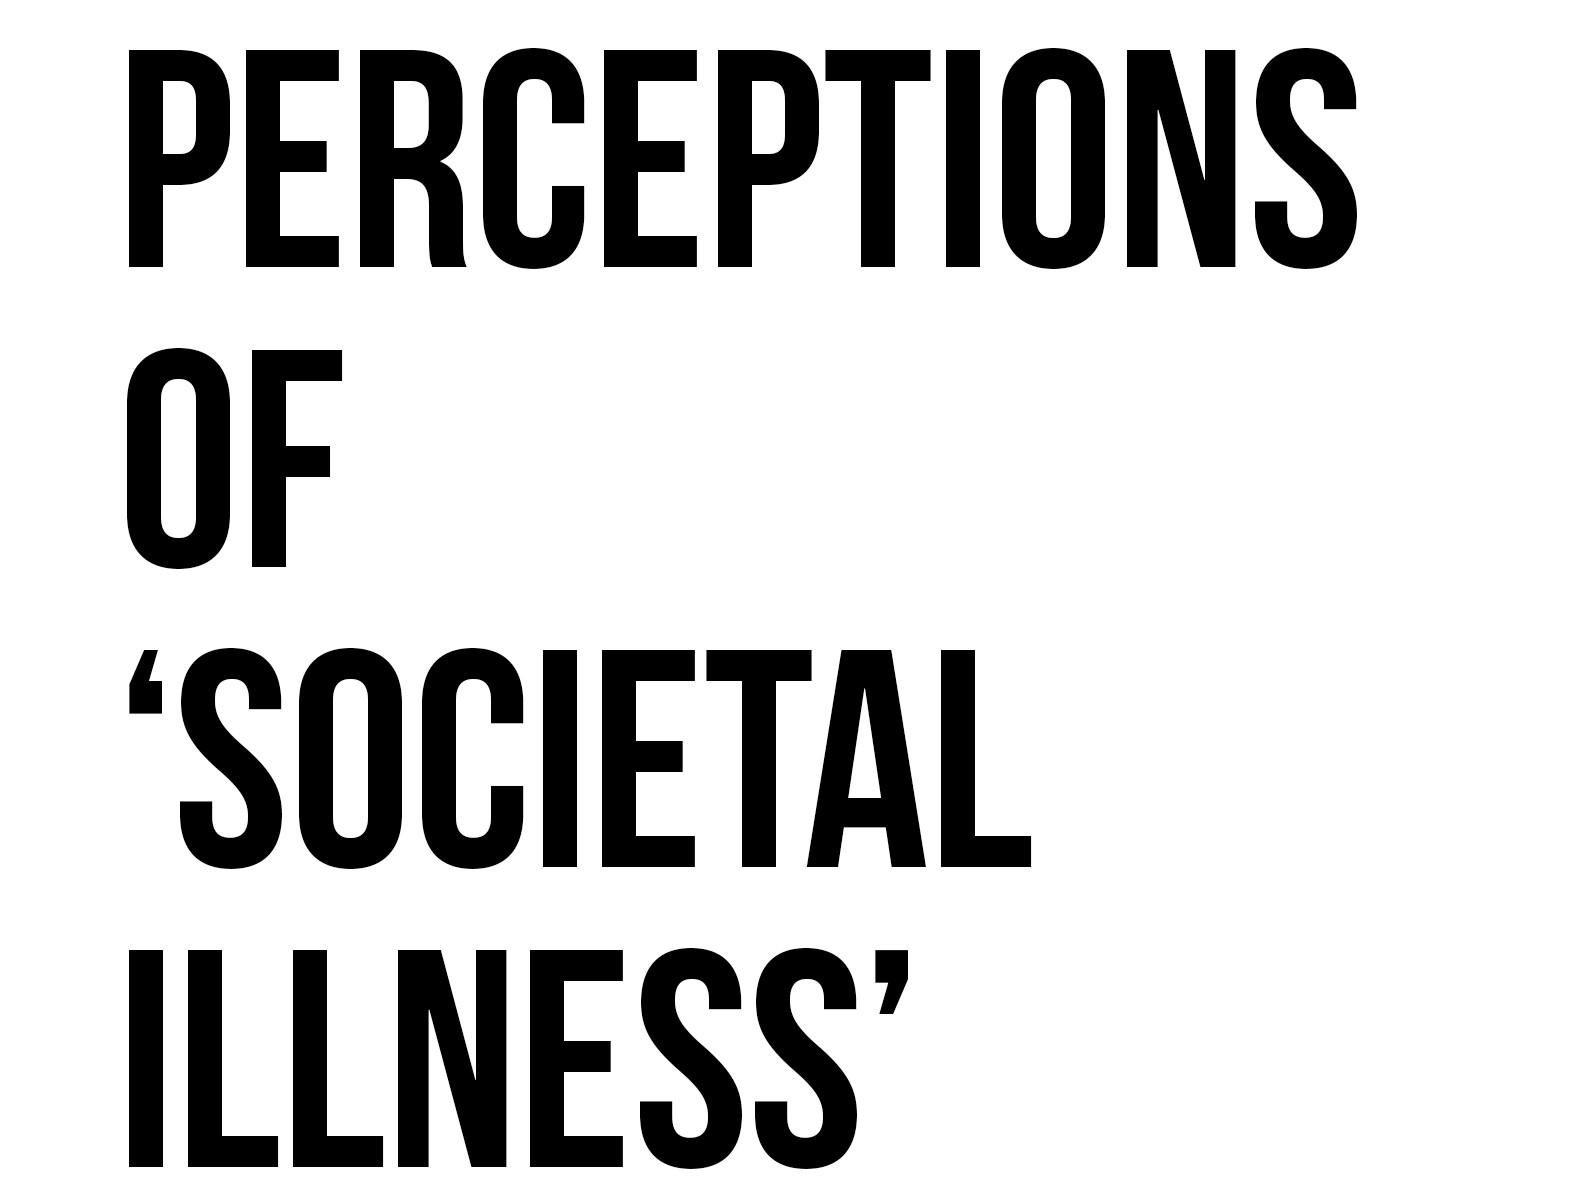 Perceptions of 'Societal Illness'